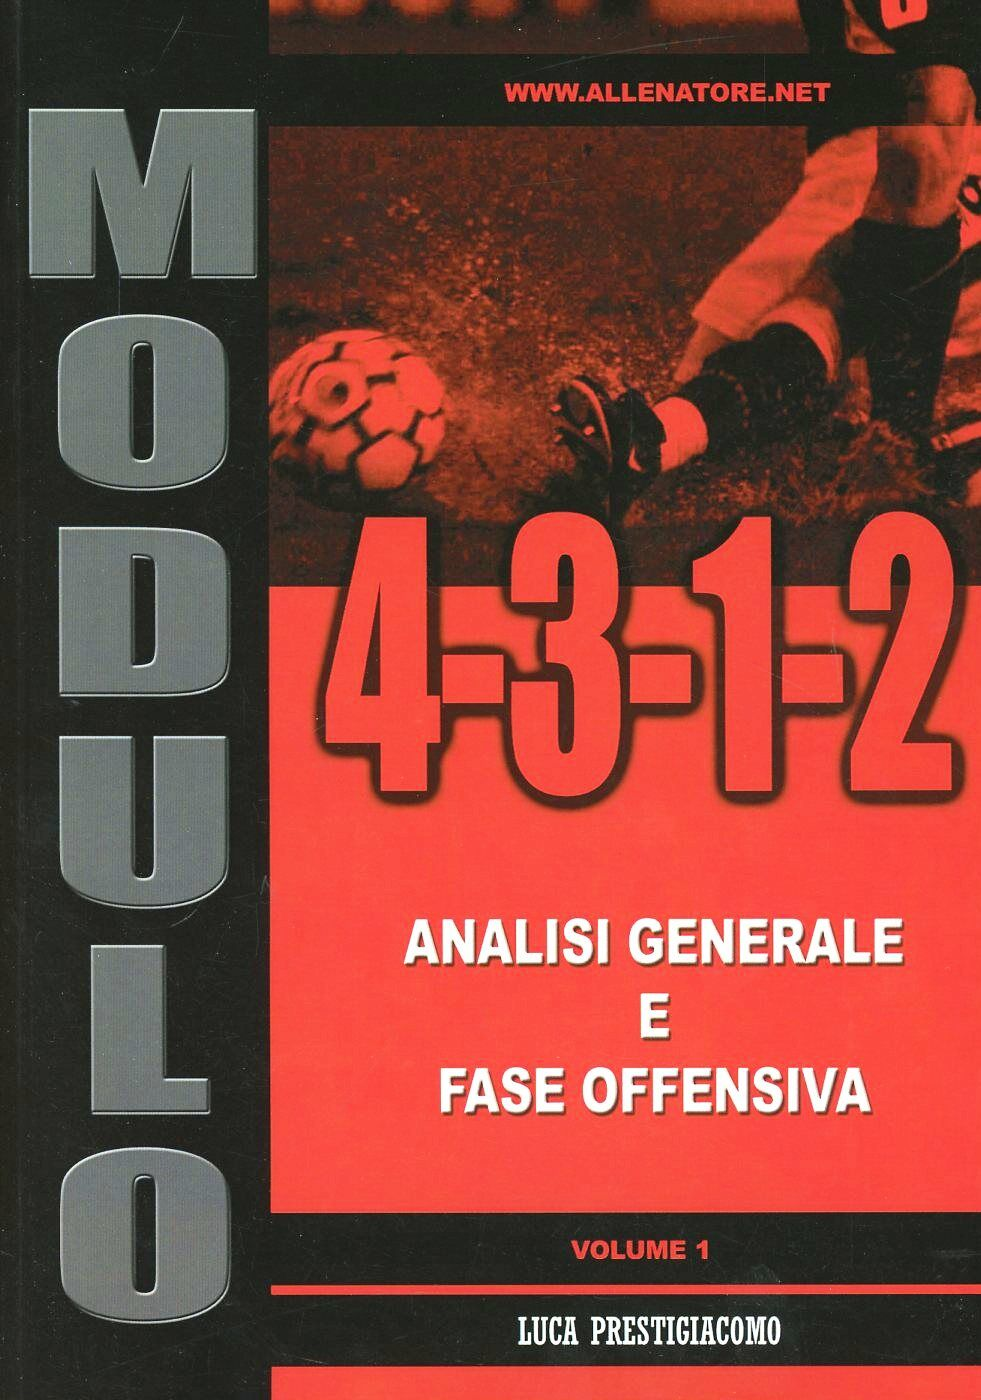 4-3-1-2 Analisi generale e fase offensiva